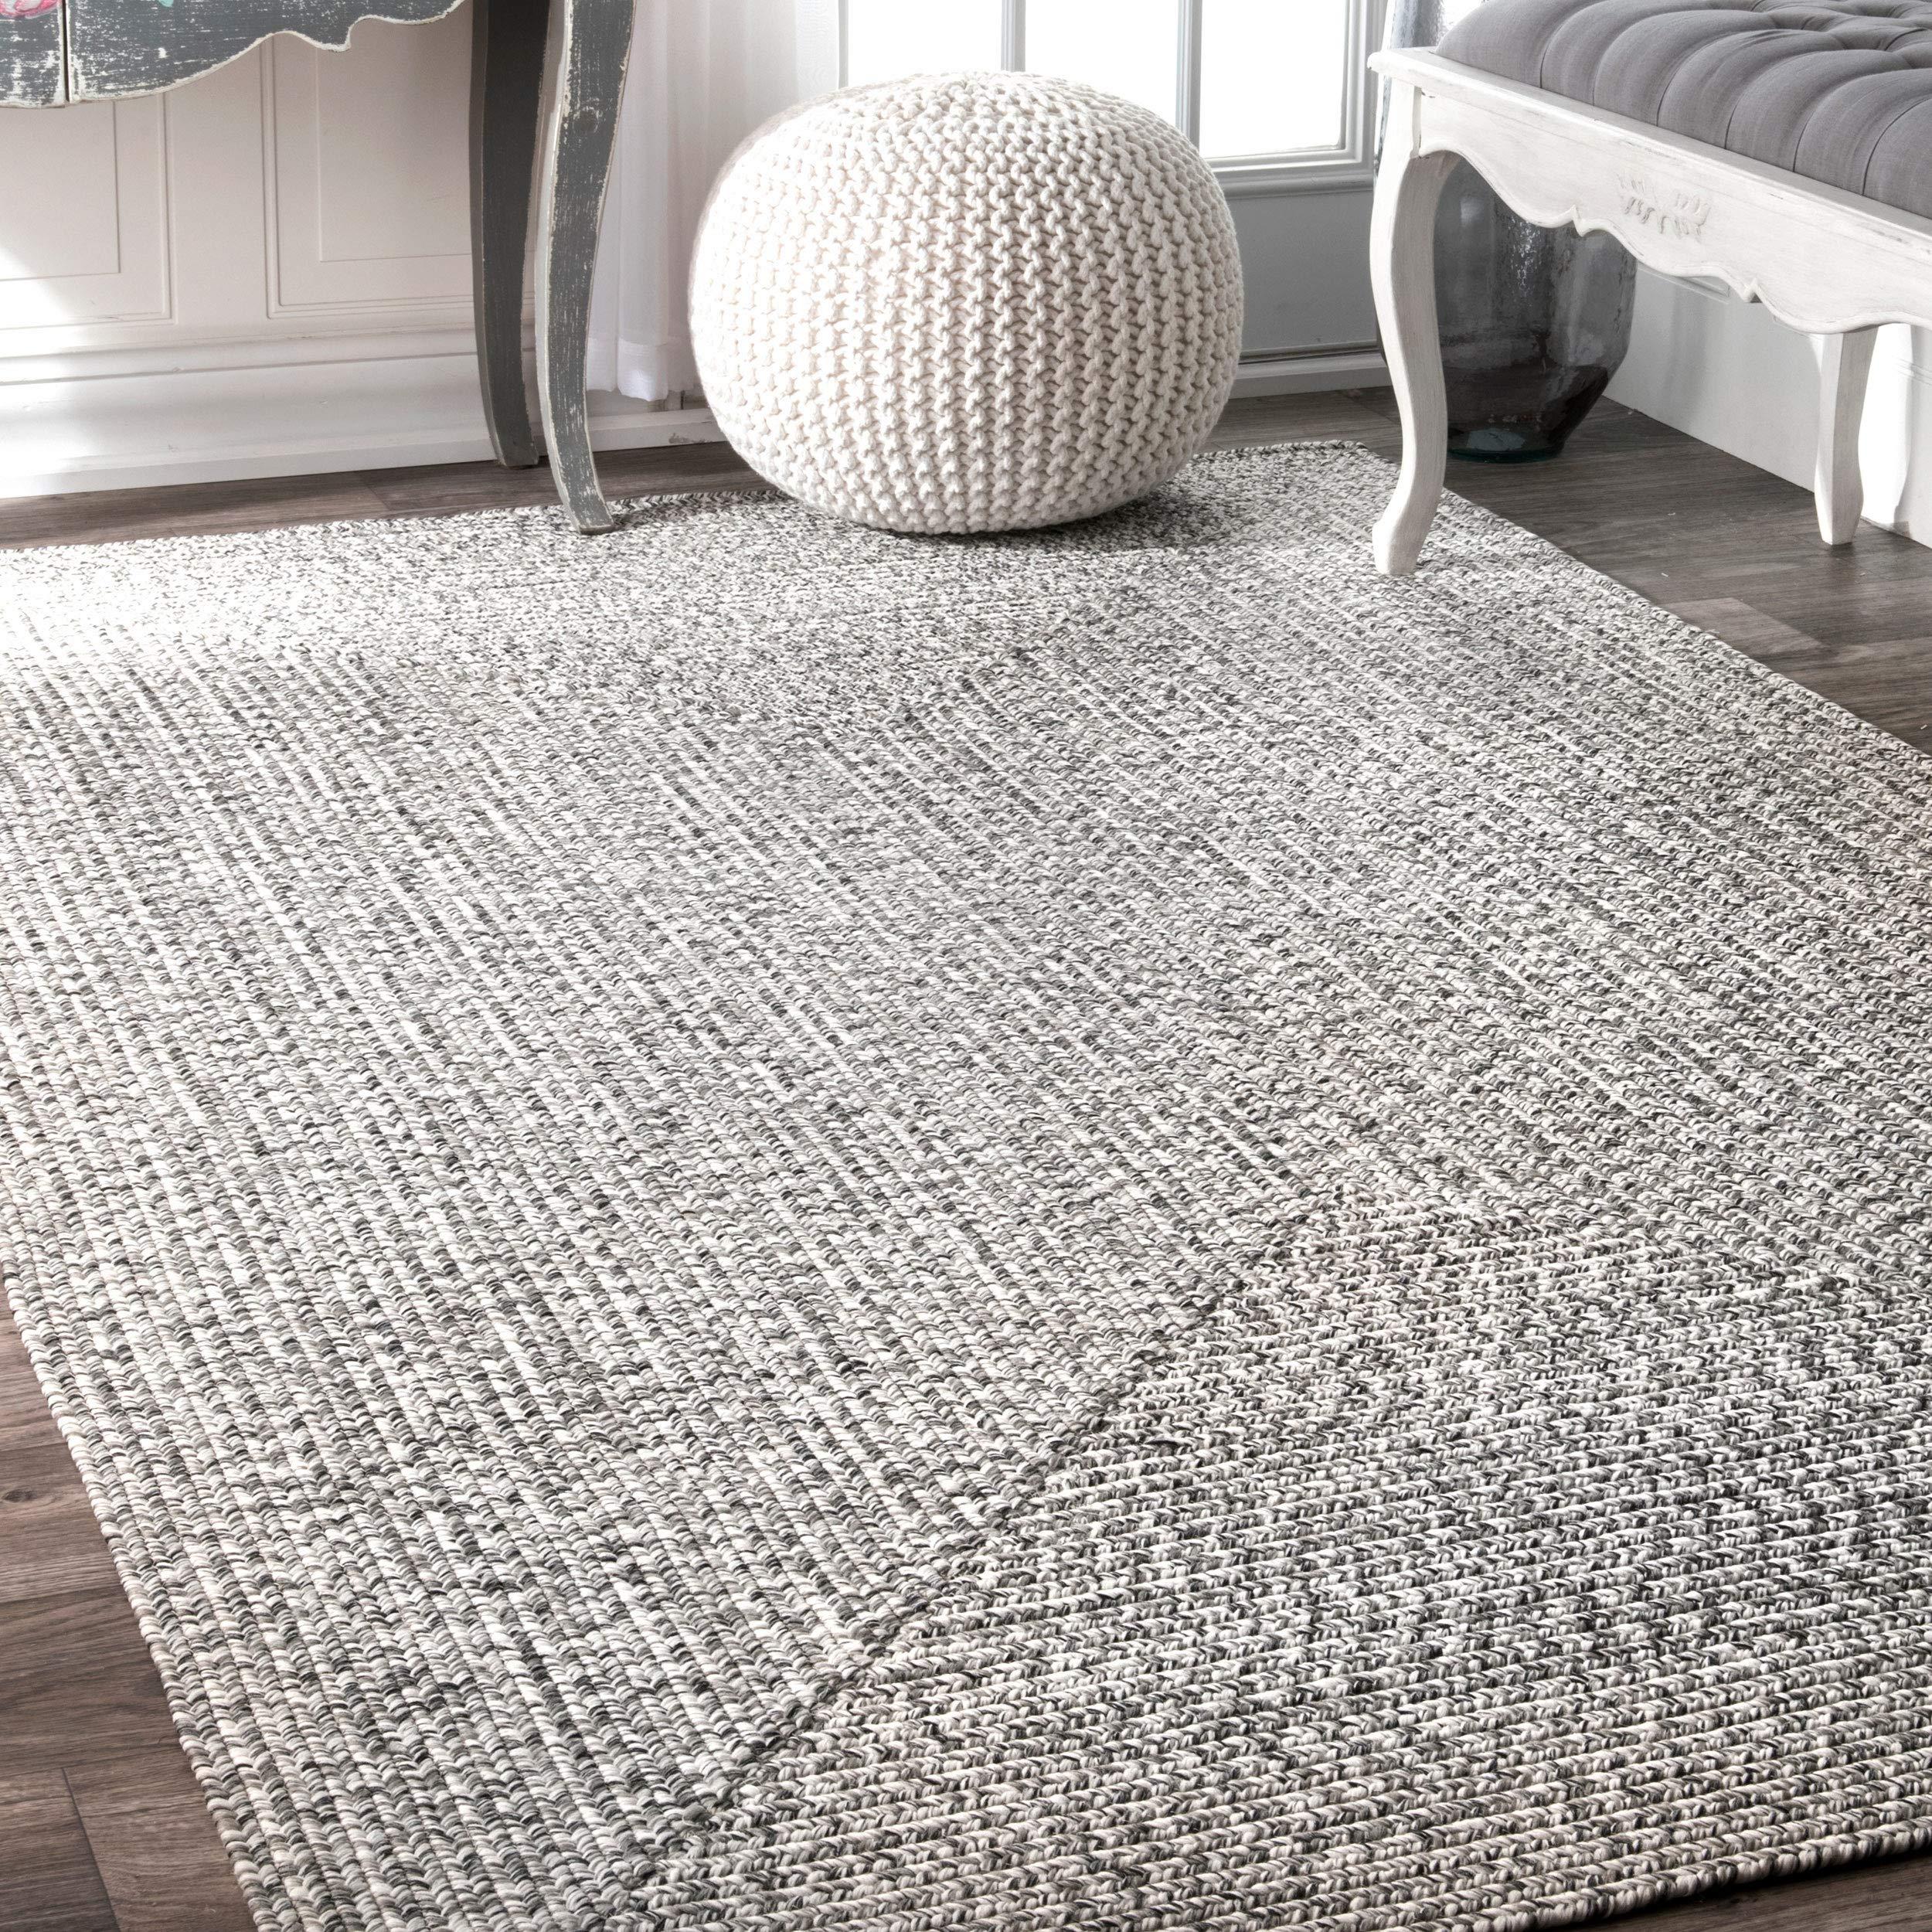 nuLOOM Lefebvre Braided Indoor/Outdoor Accent Rug, 2' x 3', Light Grey